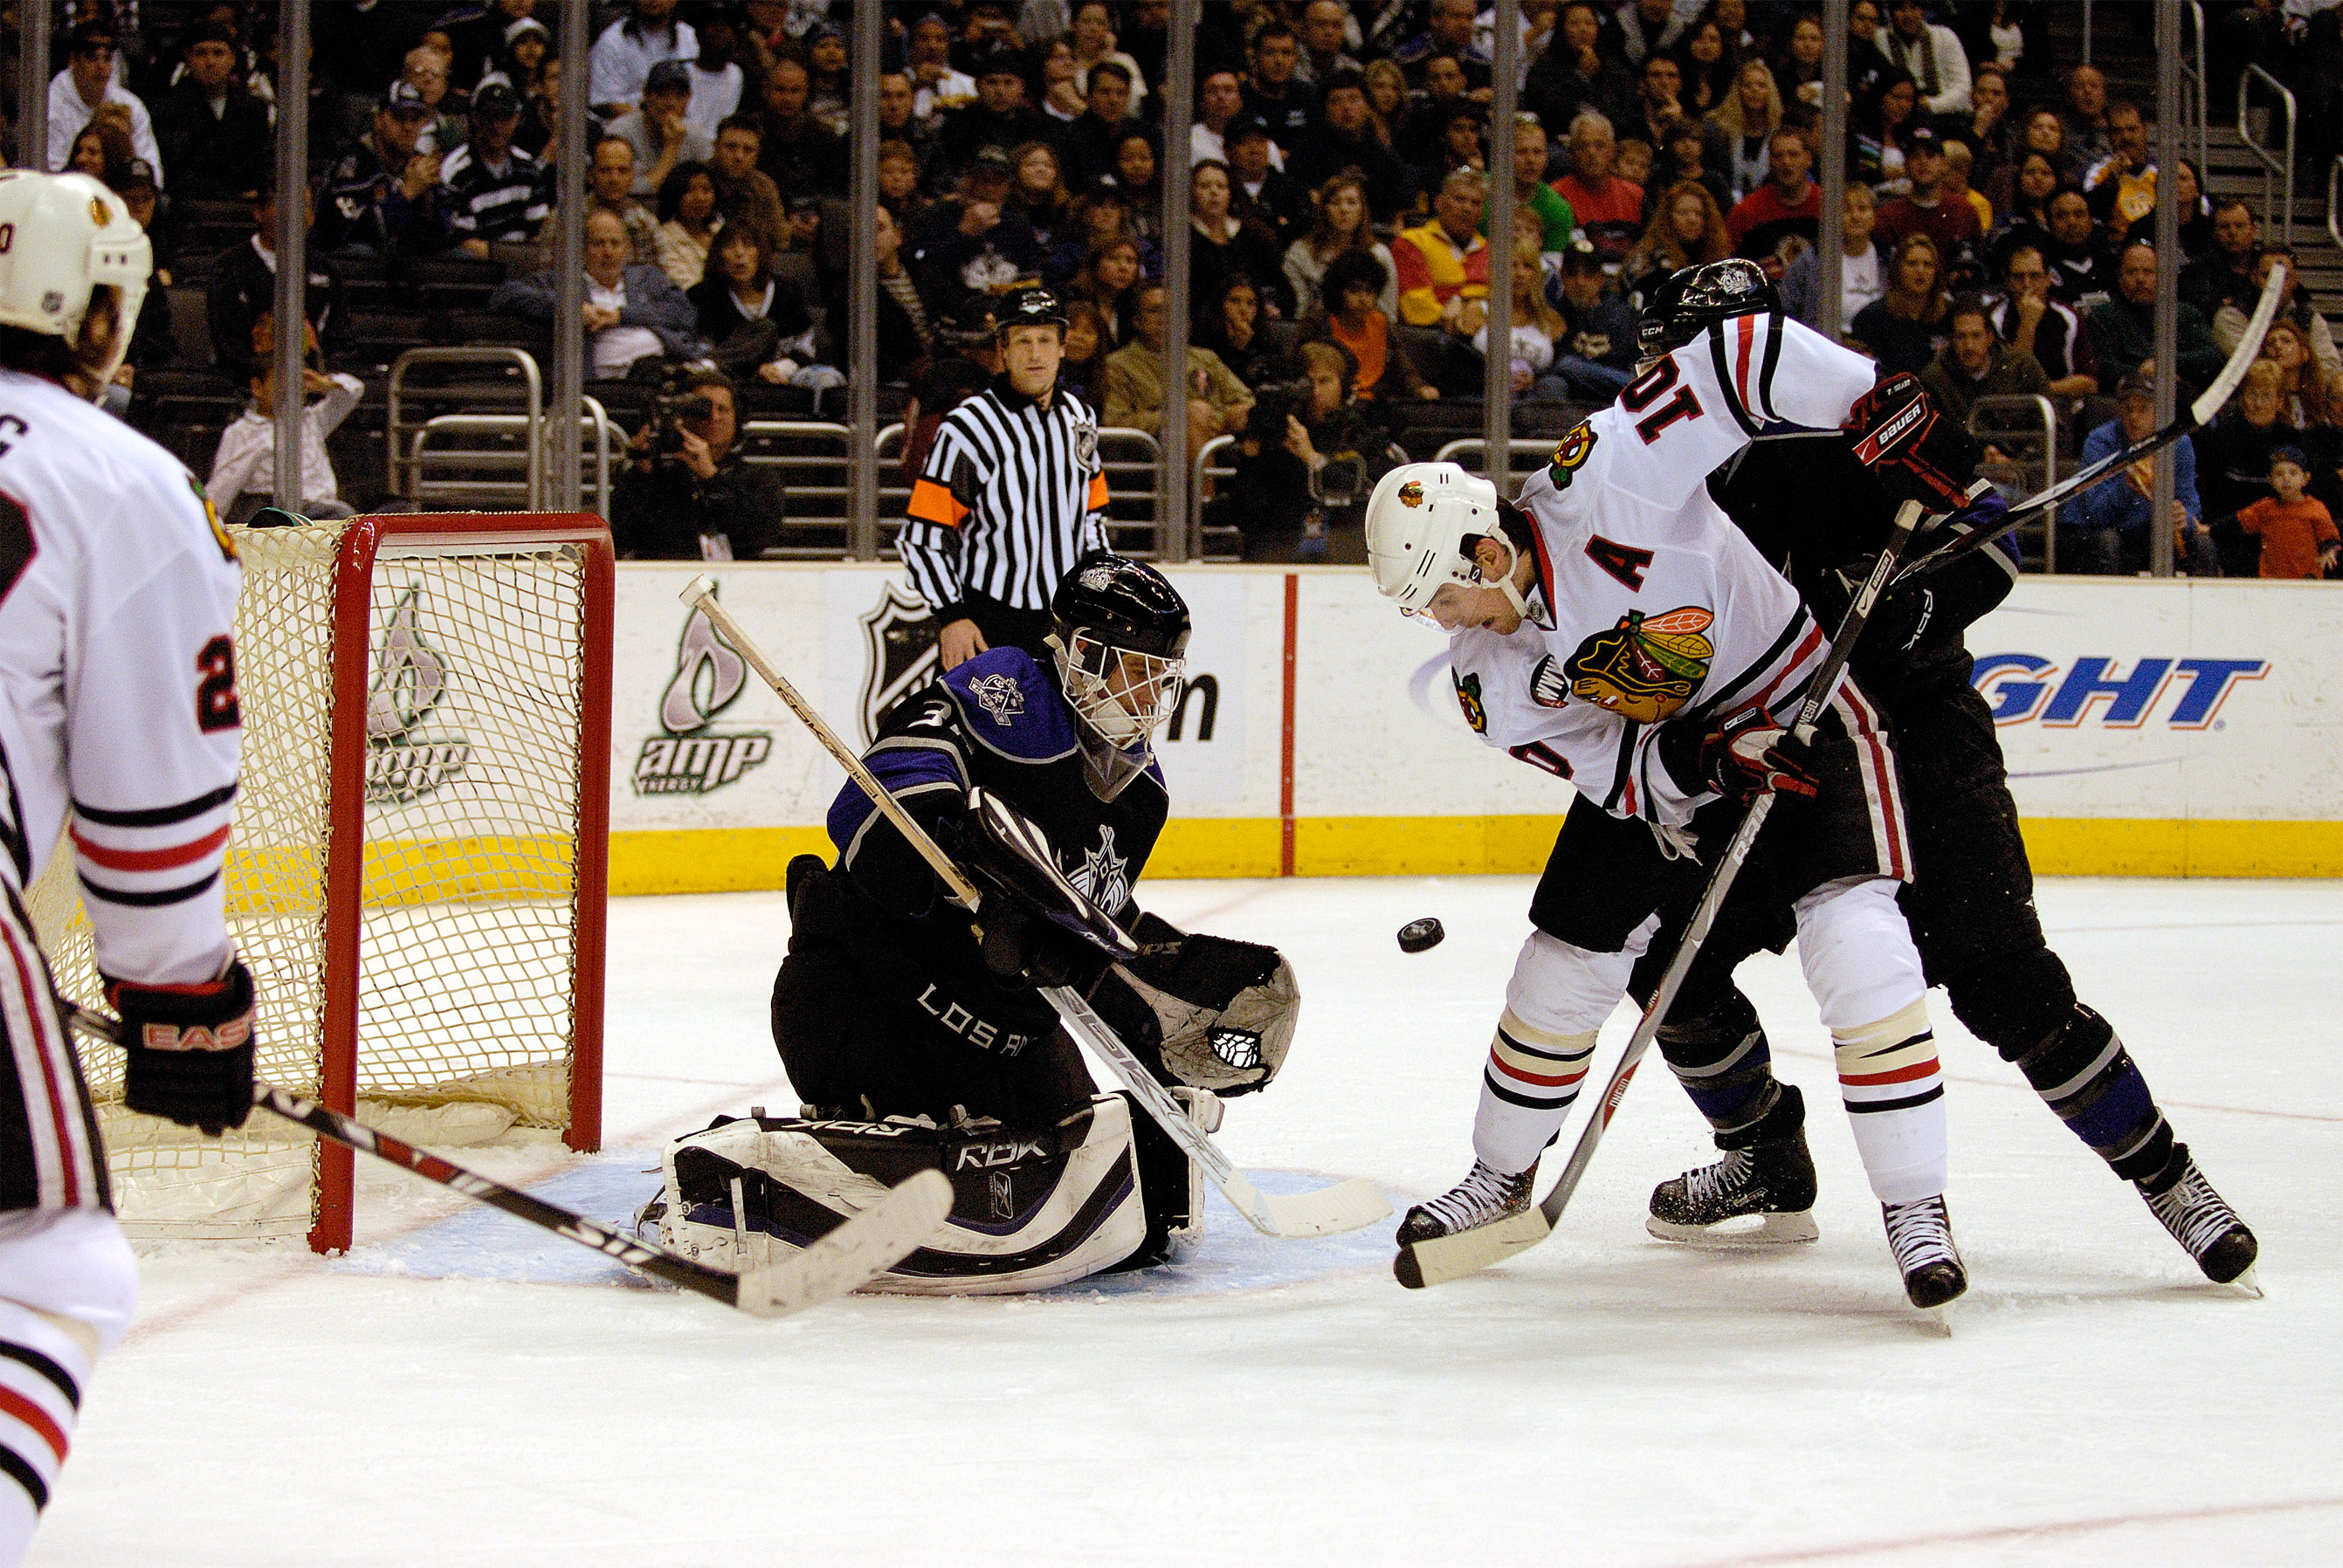 NHL Regular Season GameChicago Blackhawks vs. Los Angeles Kings© jason arnold / jasonarnoldphotography.com